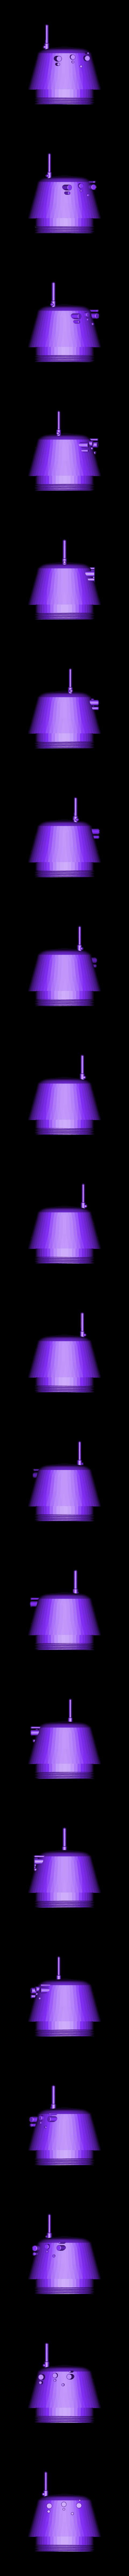 R5-J2_Head_20x.stl Download free STL file Star Wars R5-J2 Imperial Astromech Droid • 3D printable object, A_SKEWED_VIEW_3D